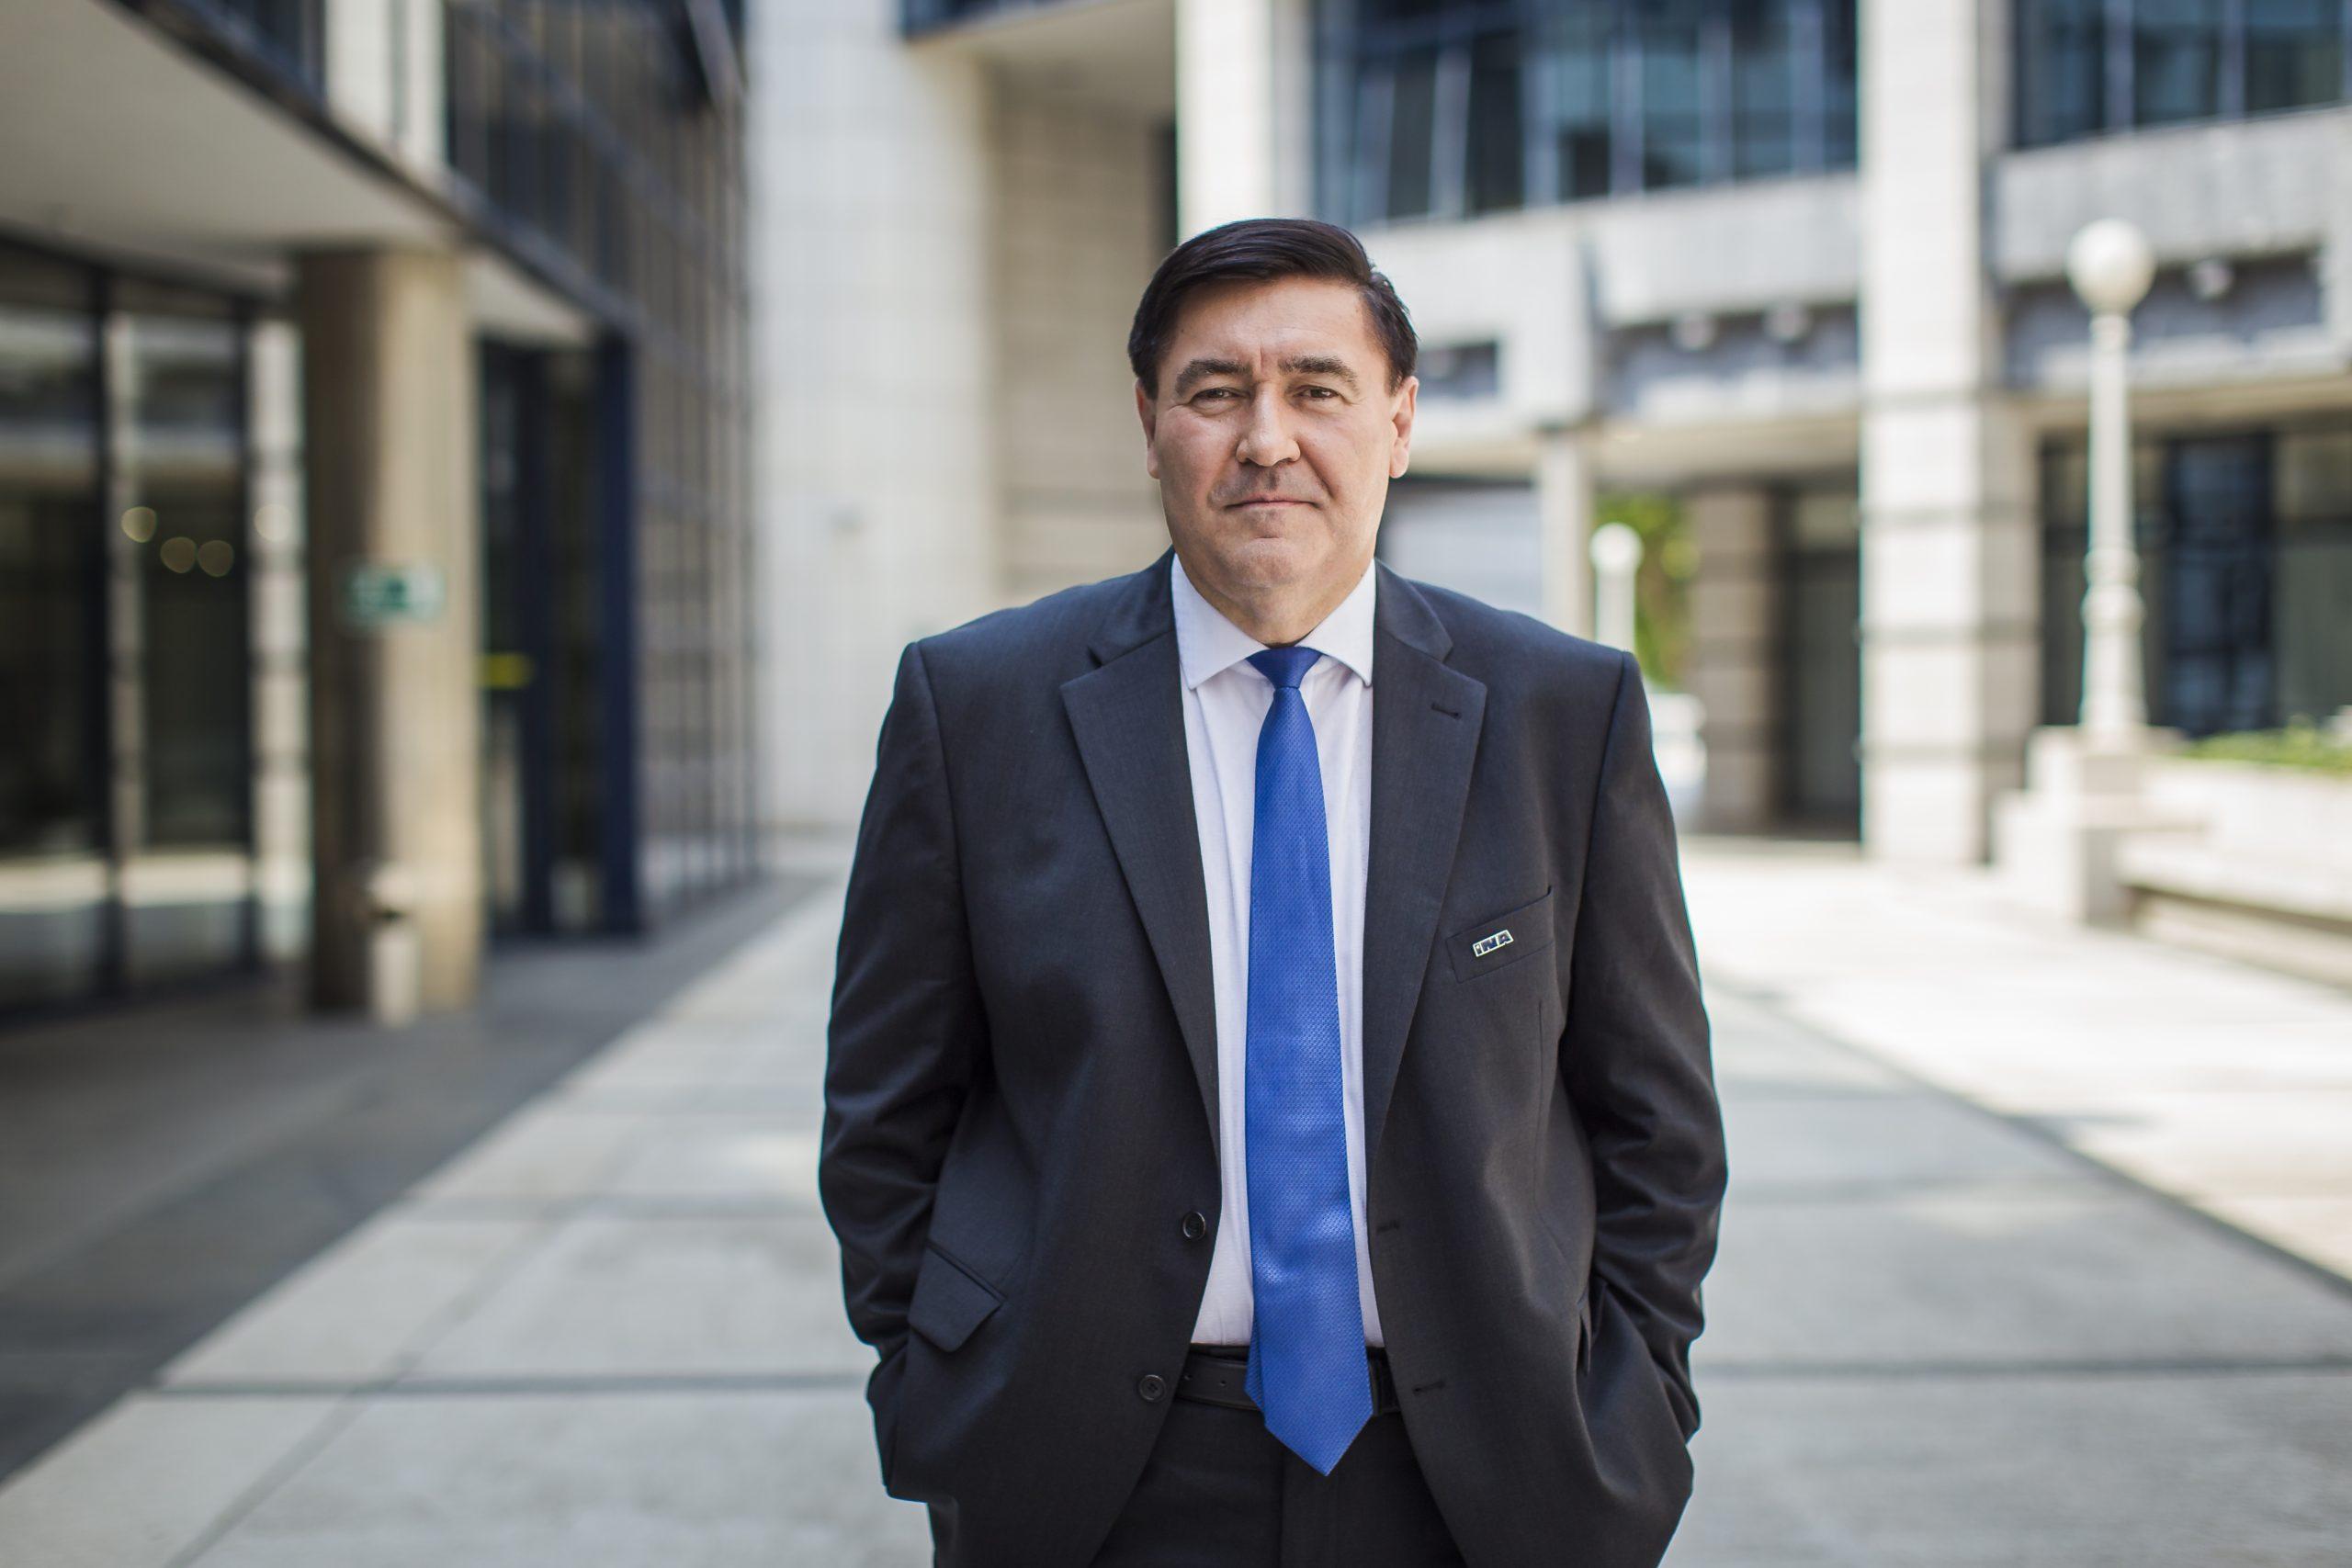 Sándor Fasimon, President of Management Board, INA 1 - hrpsor Hrvatski poslovni savjet za održivi razvoj